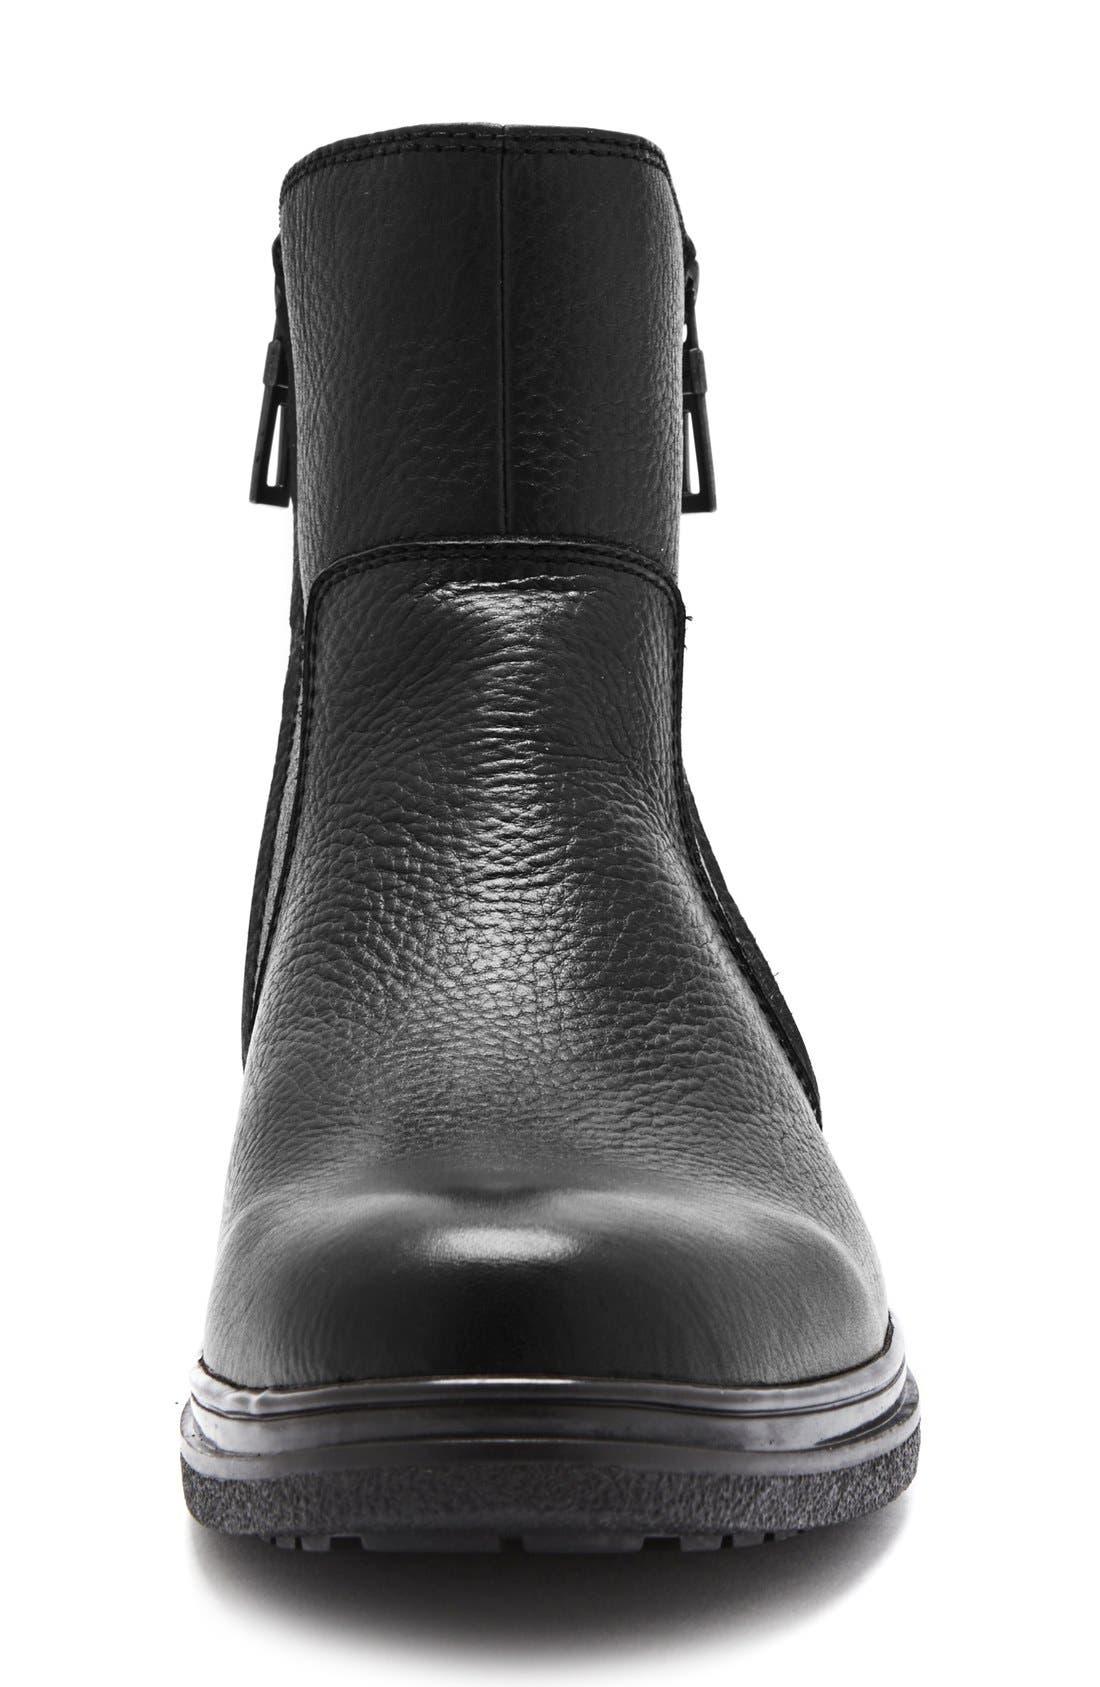 Alternate Image 3  - Blondo 'Brawn' Waterproof Zip Boot (Men)